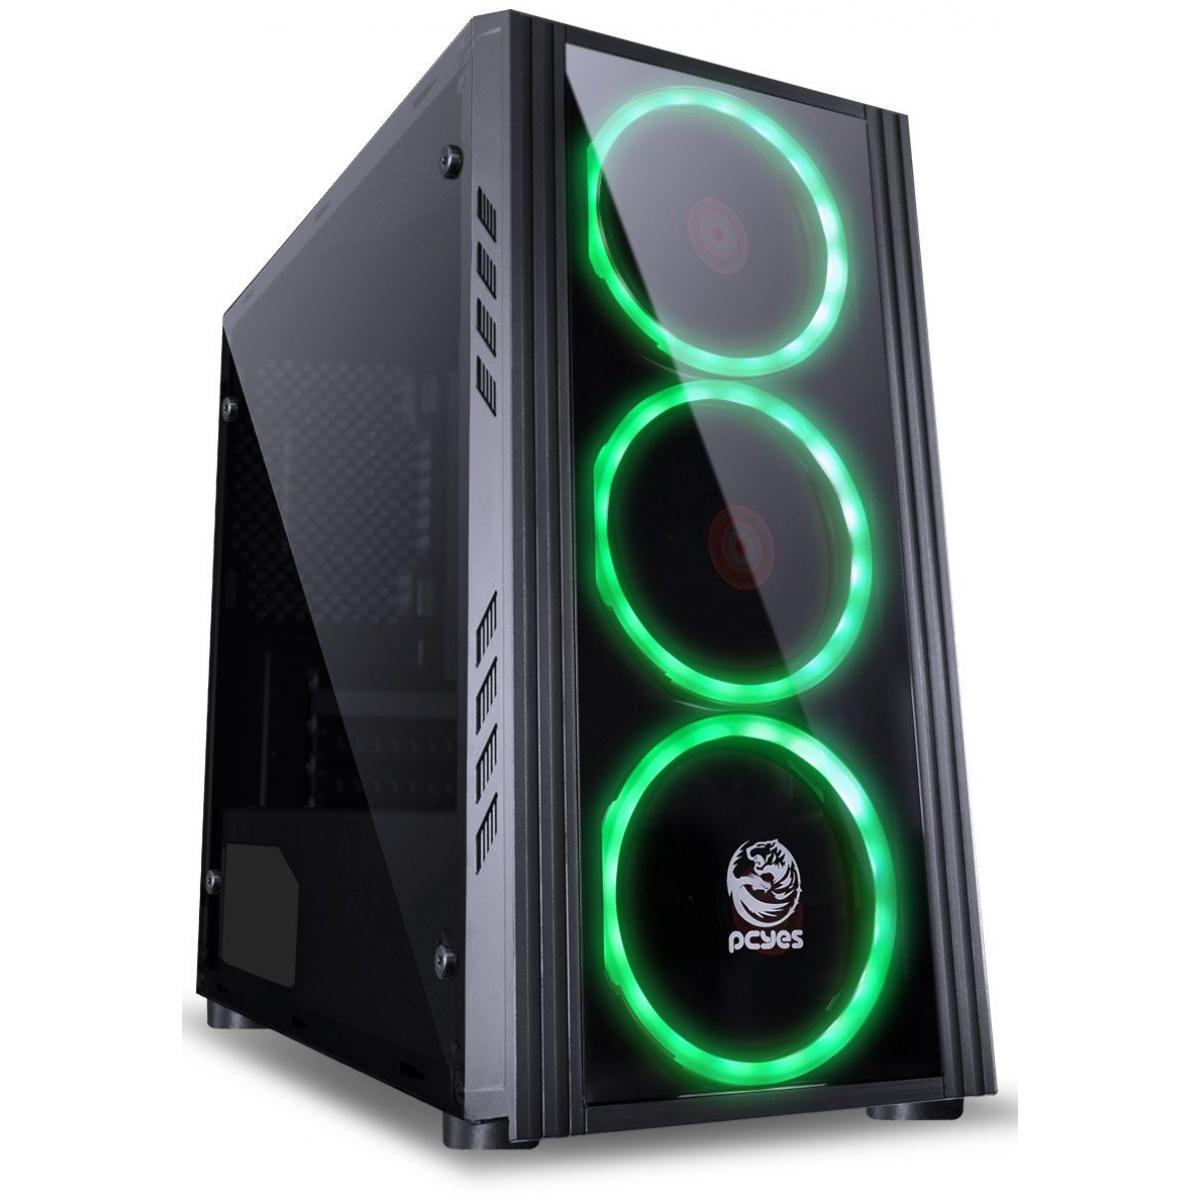 Gabinete Gamer PCyes Saturn, Mid Tower, Com 3 Fans Green, Lateral de Acrílico, Black, Sem Fonte, SATPTVD3FCA